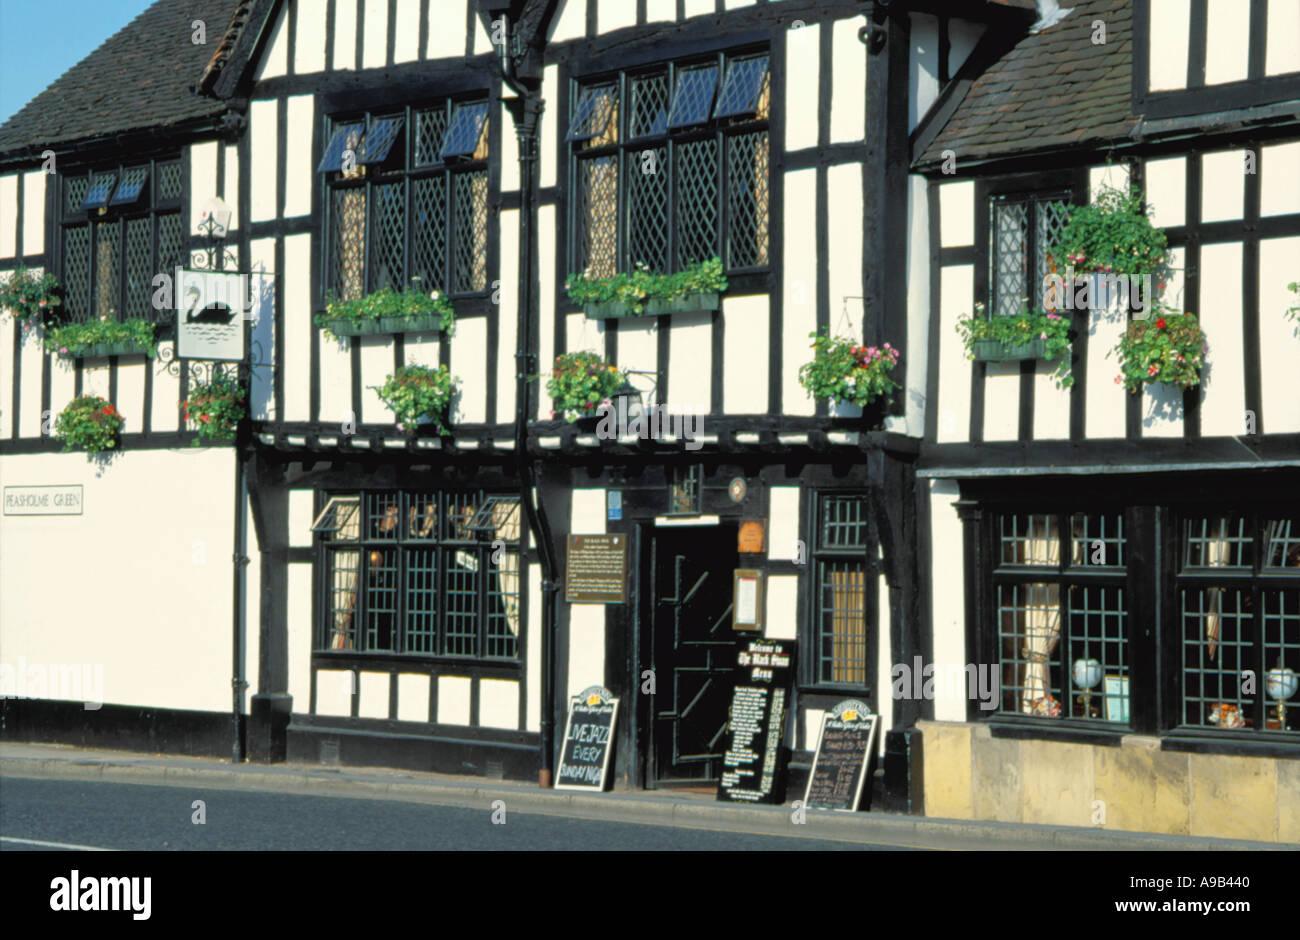 Black Swan, Peasholme Green, City of York, North Yorkshire, England, UK. - Stock Image